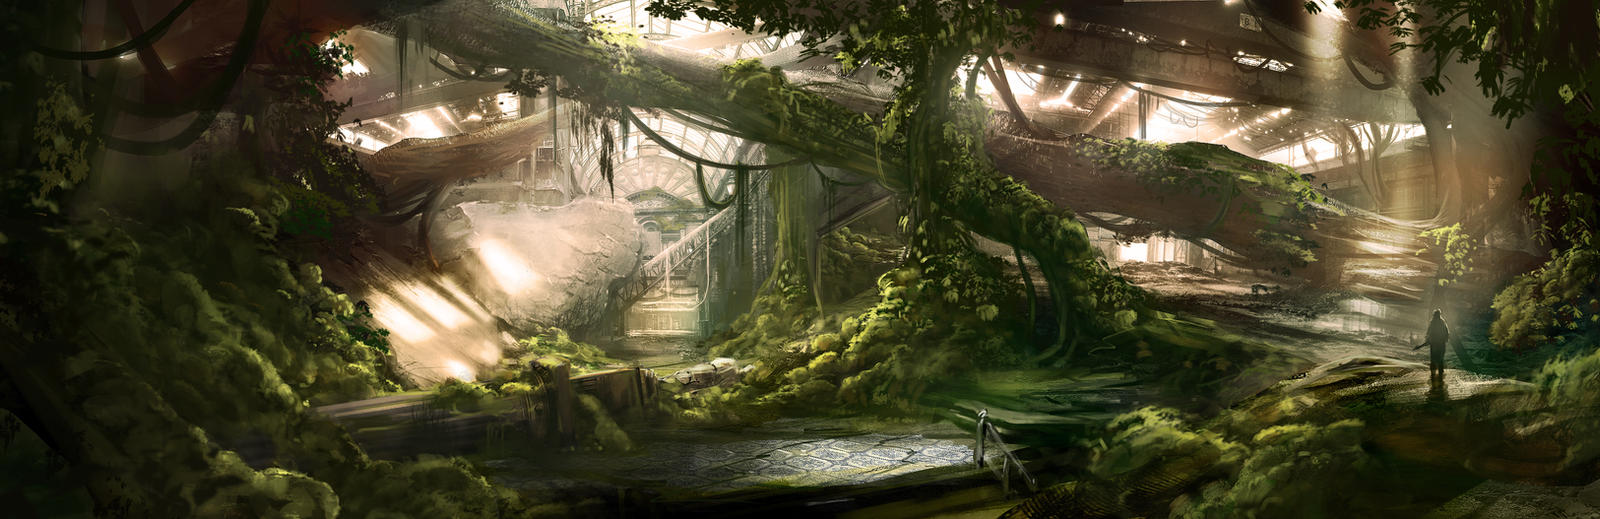 Overgrown Arcade by jordangrimmer